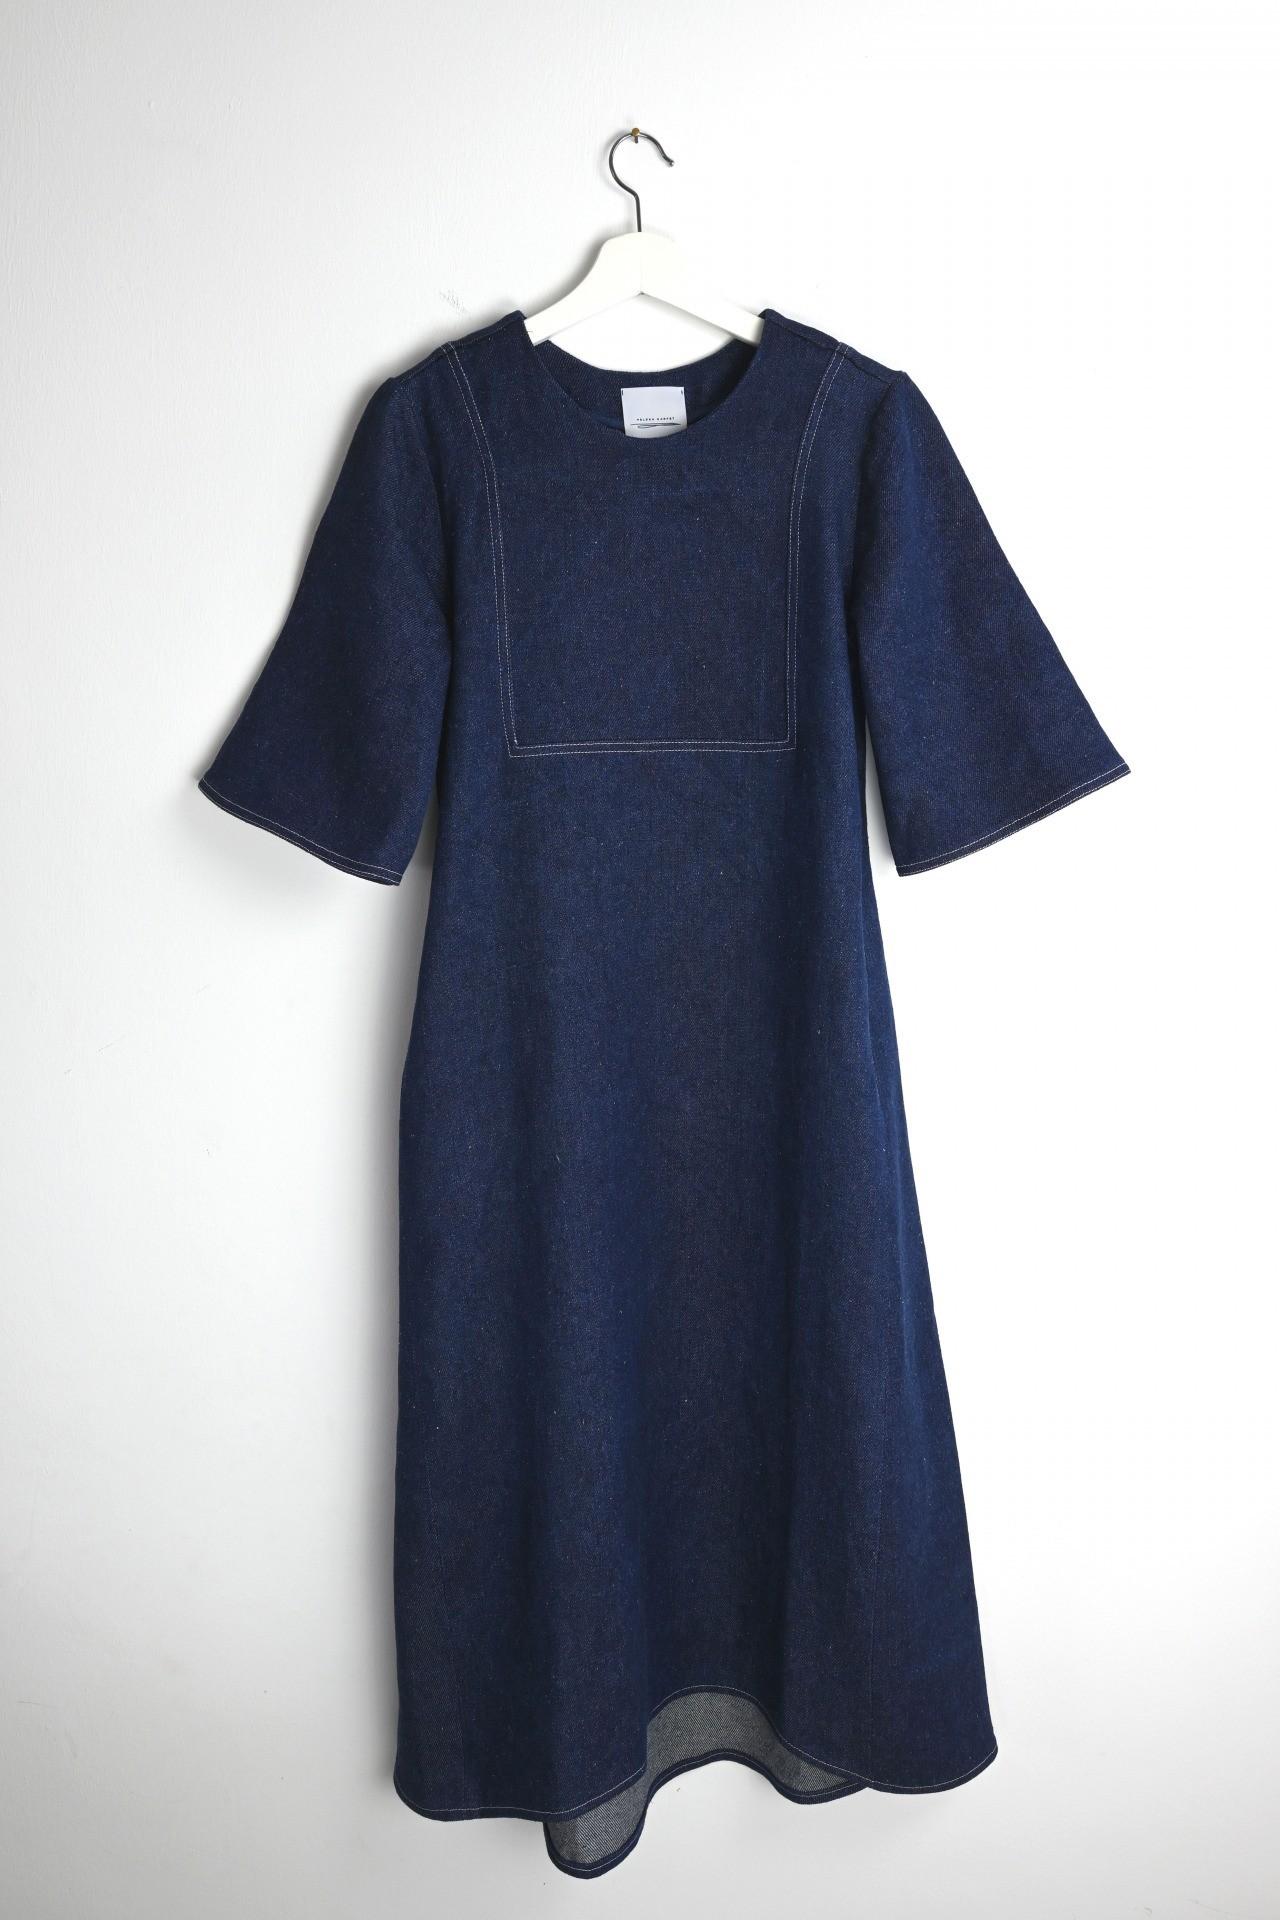 Gartenkleid indigo